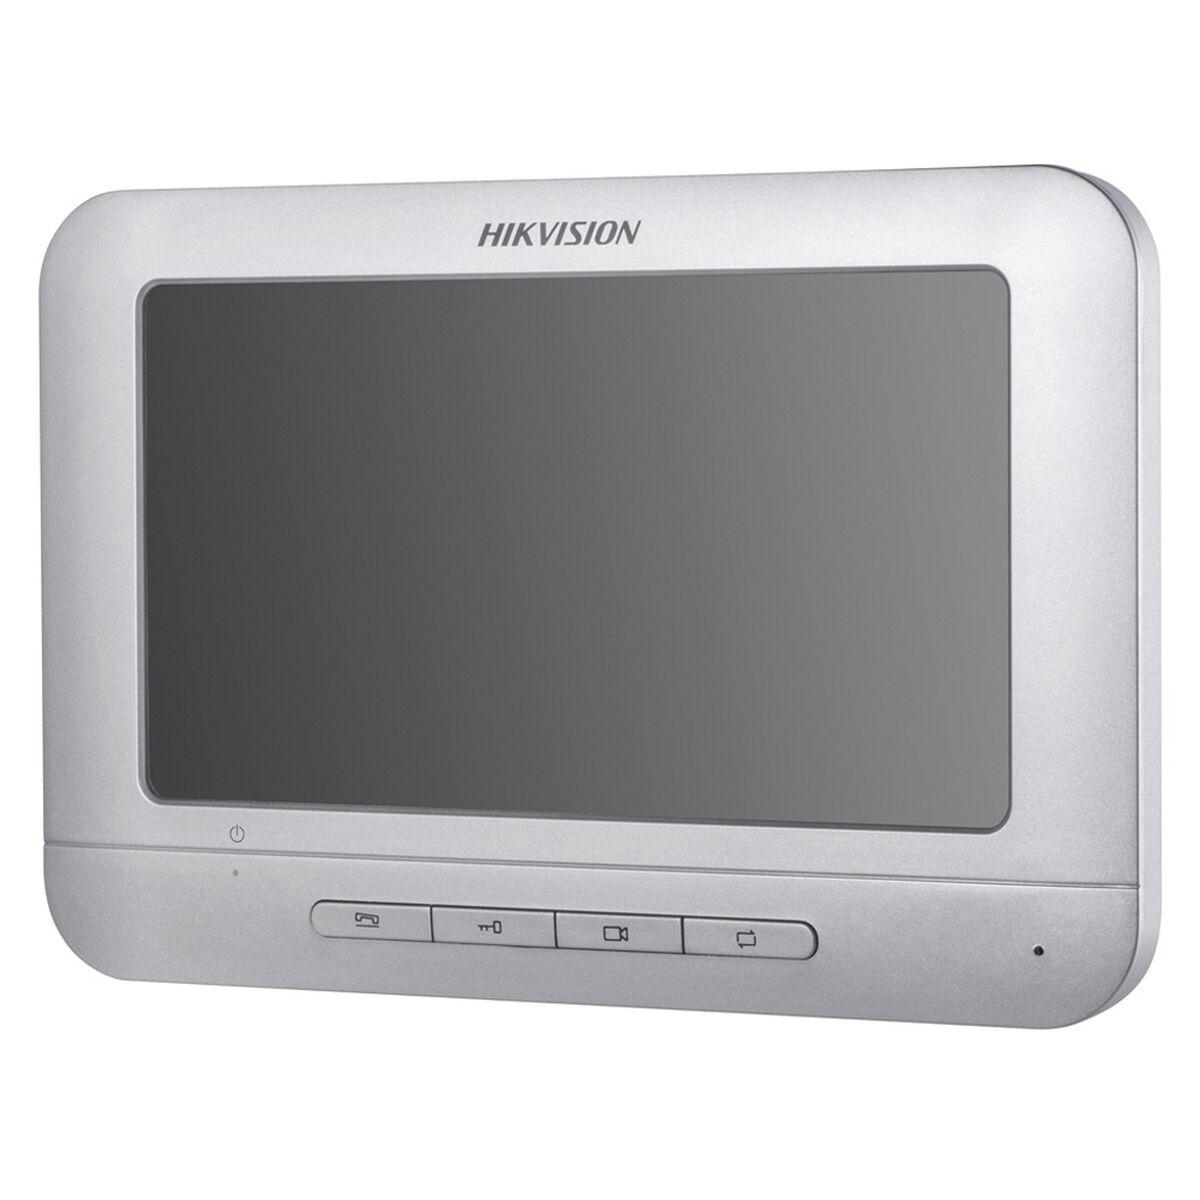 Kit Cámaras de Seguridad Hikvision Video Análogo DS-KIS203